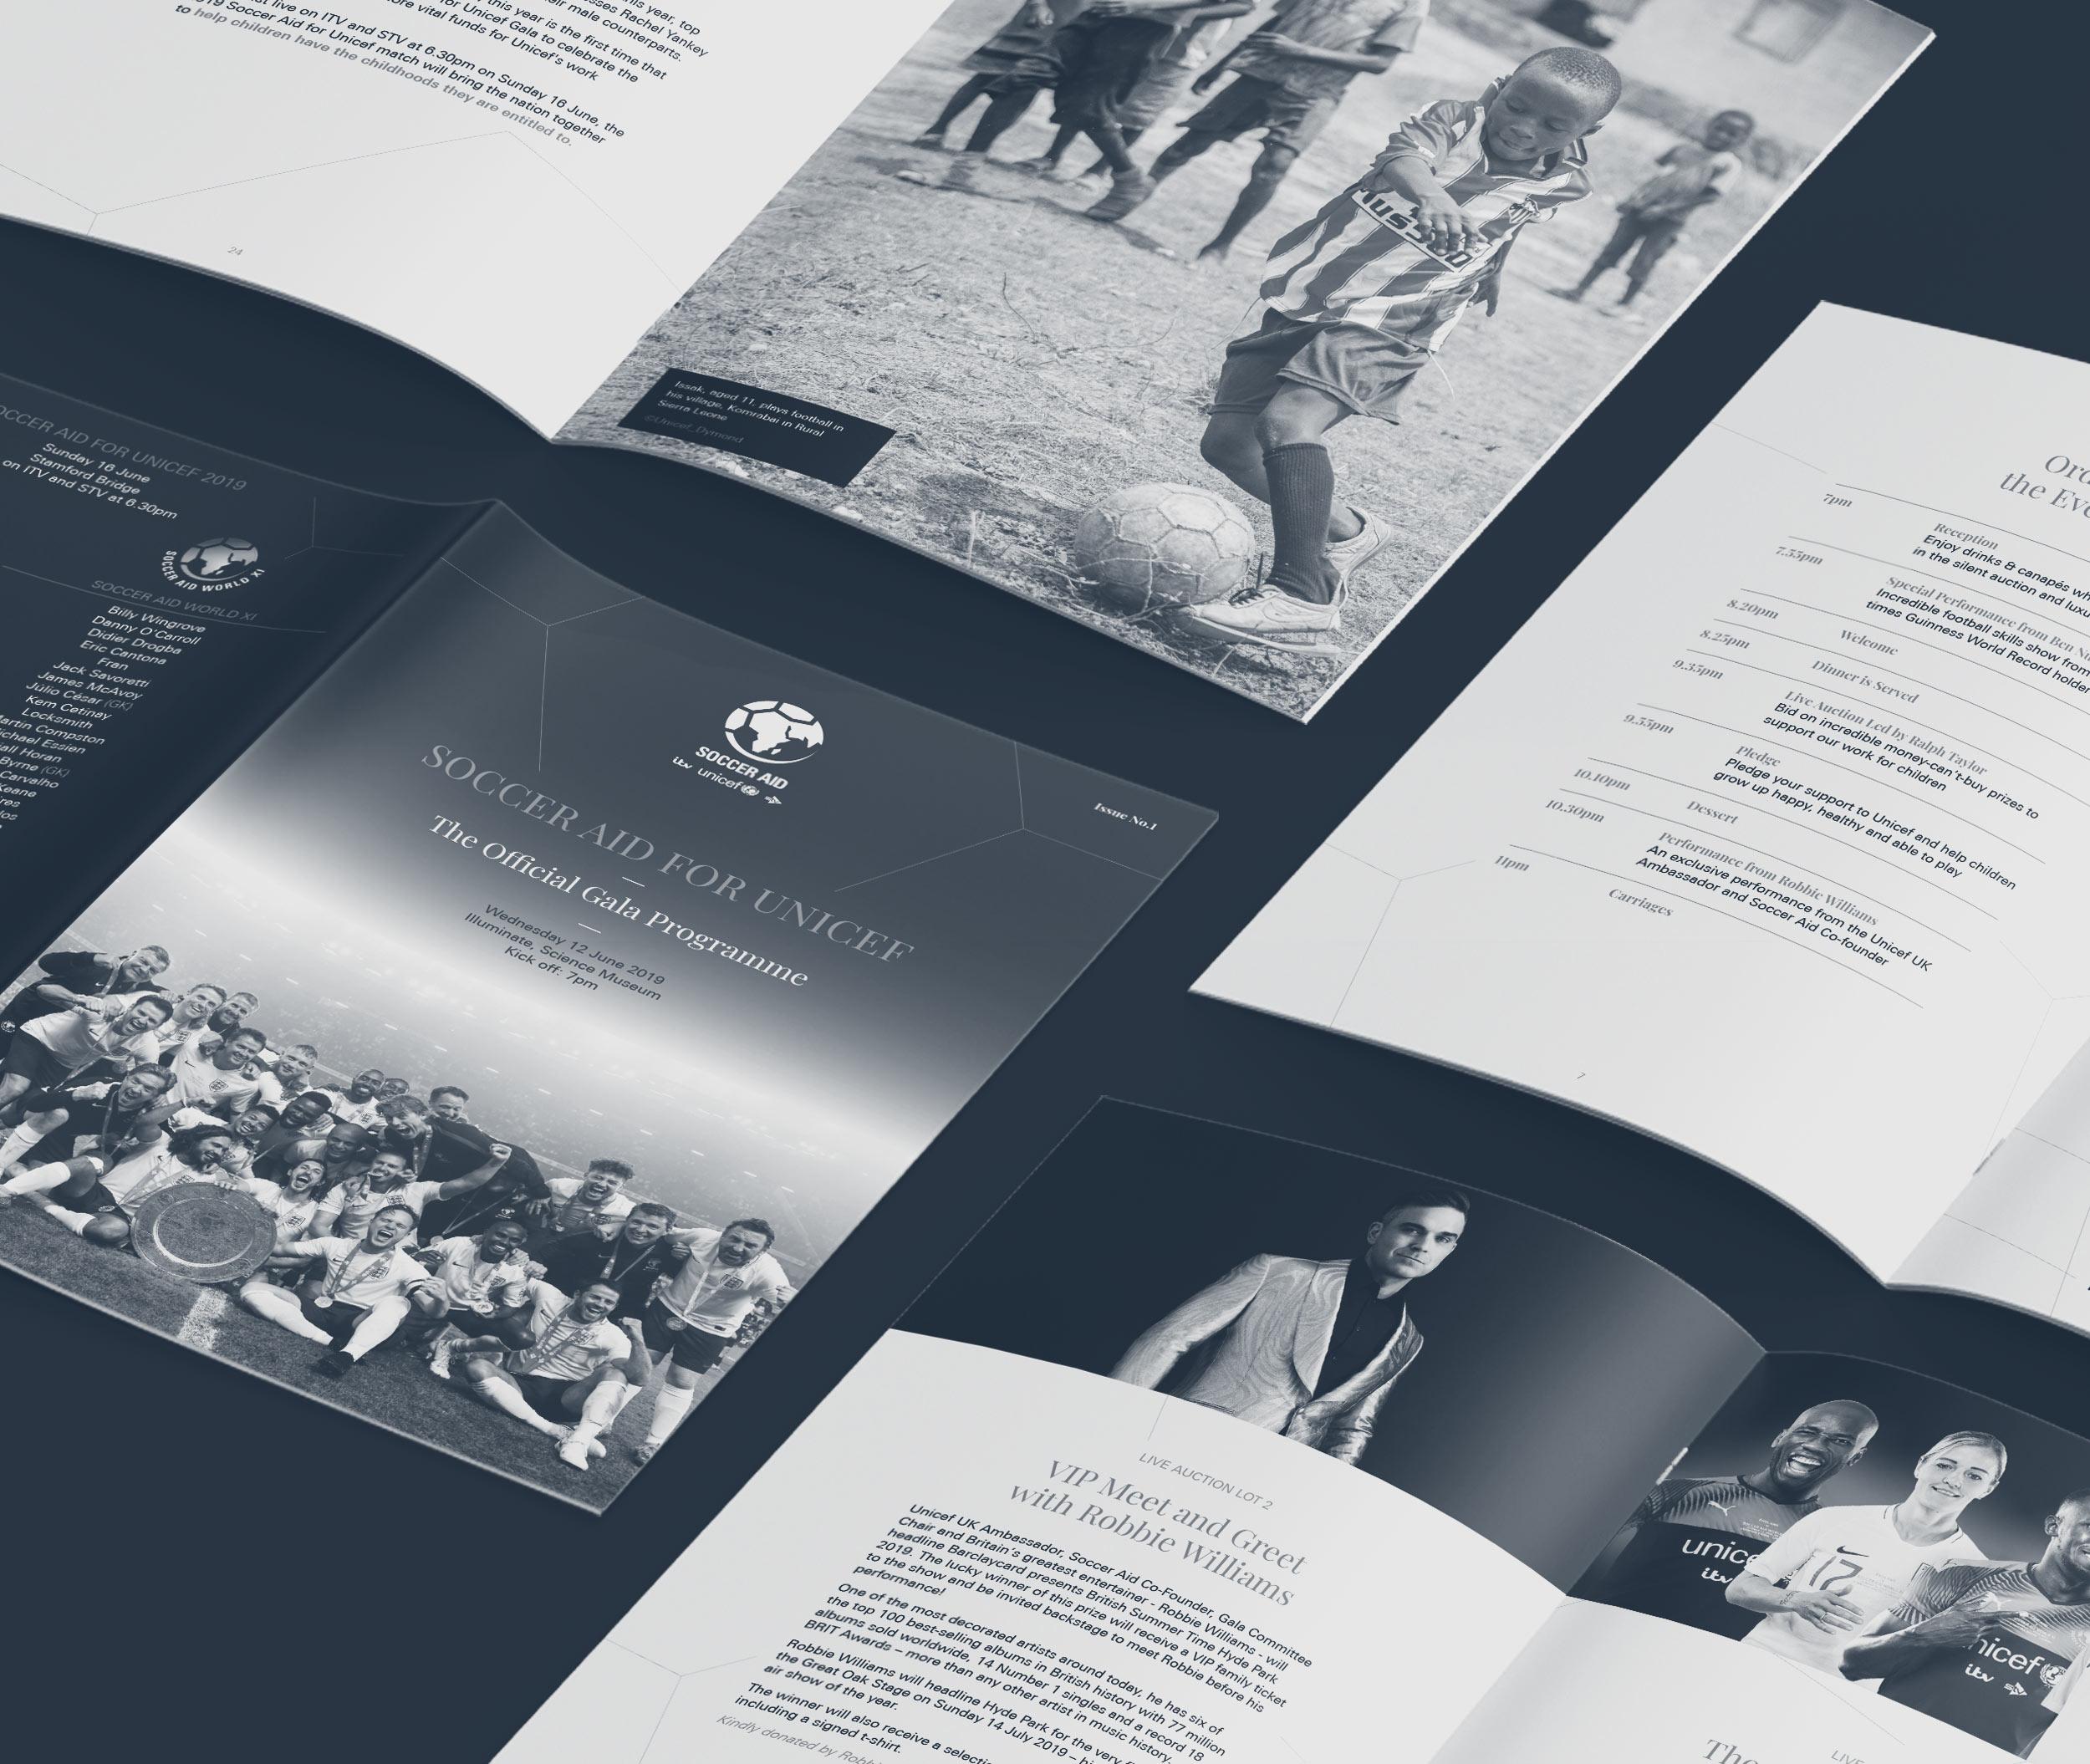 Unicef Soccer Aid gala programme